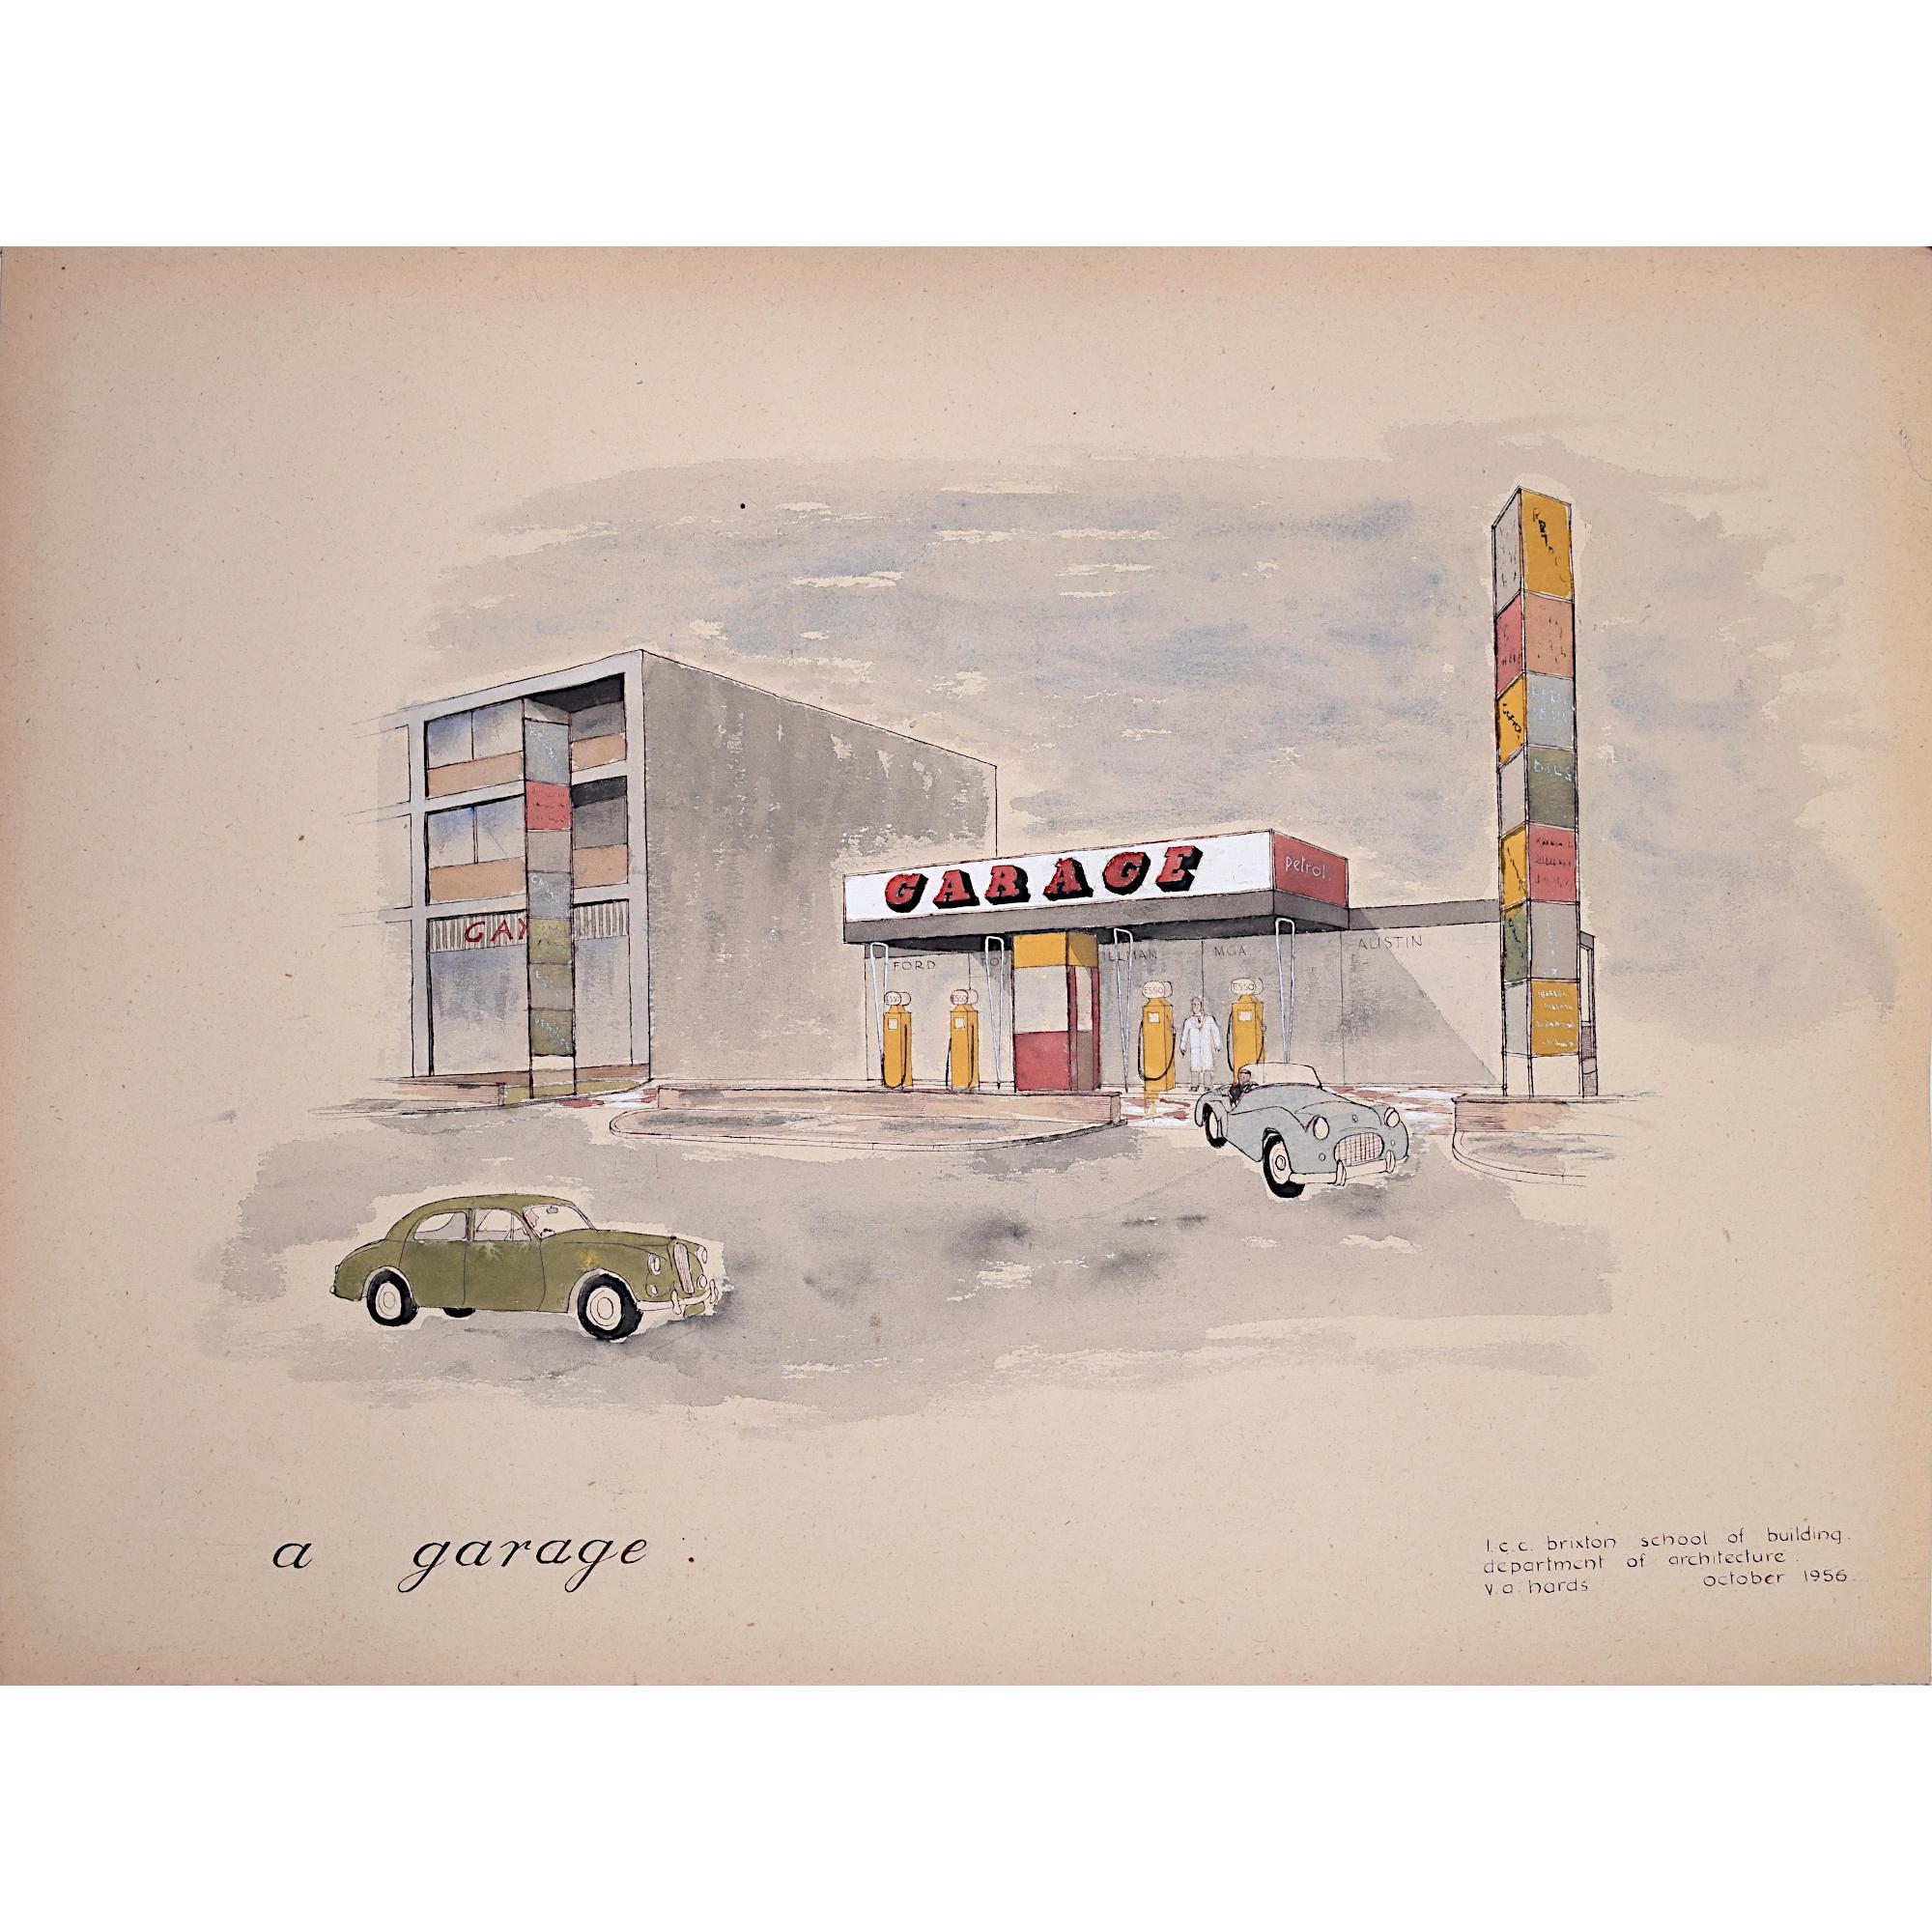 V A Hards Garage architectural drawing